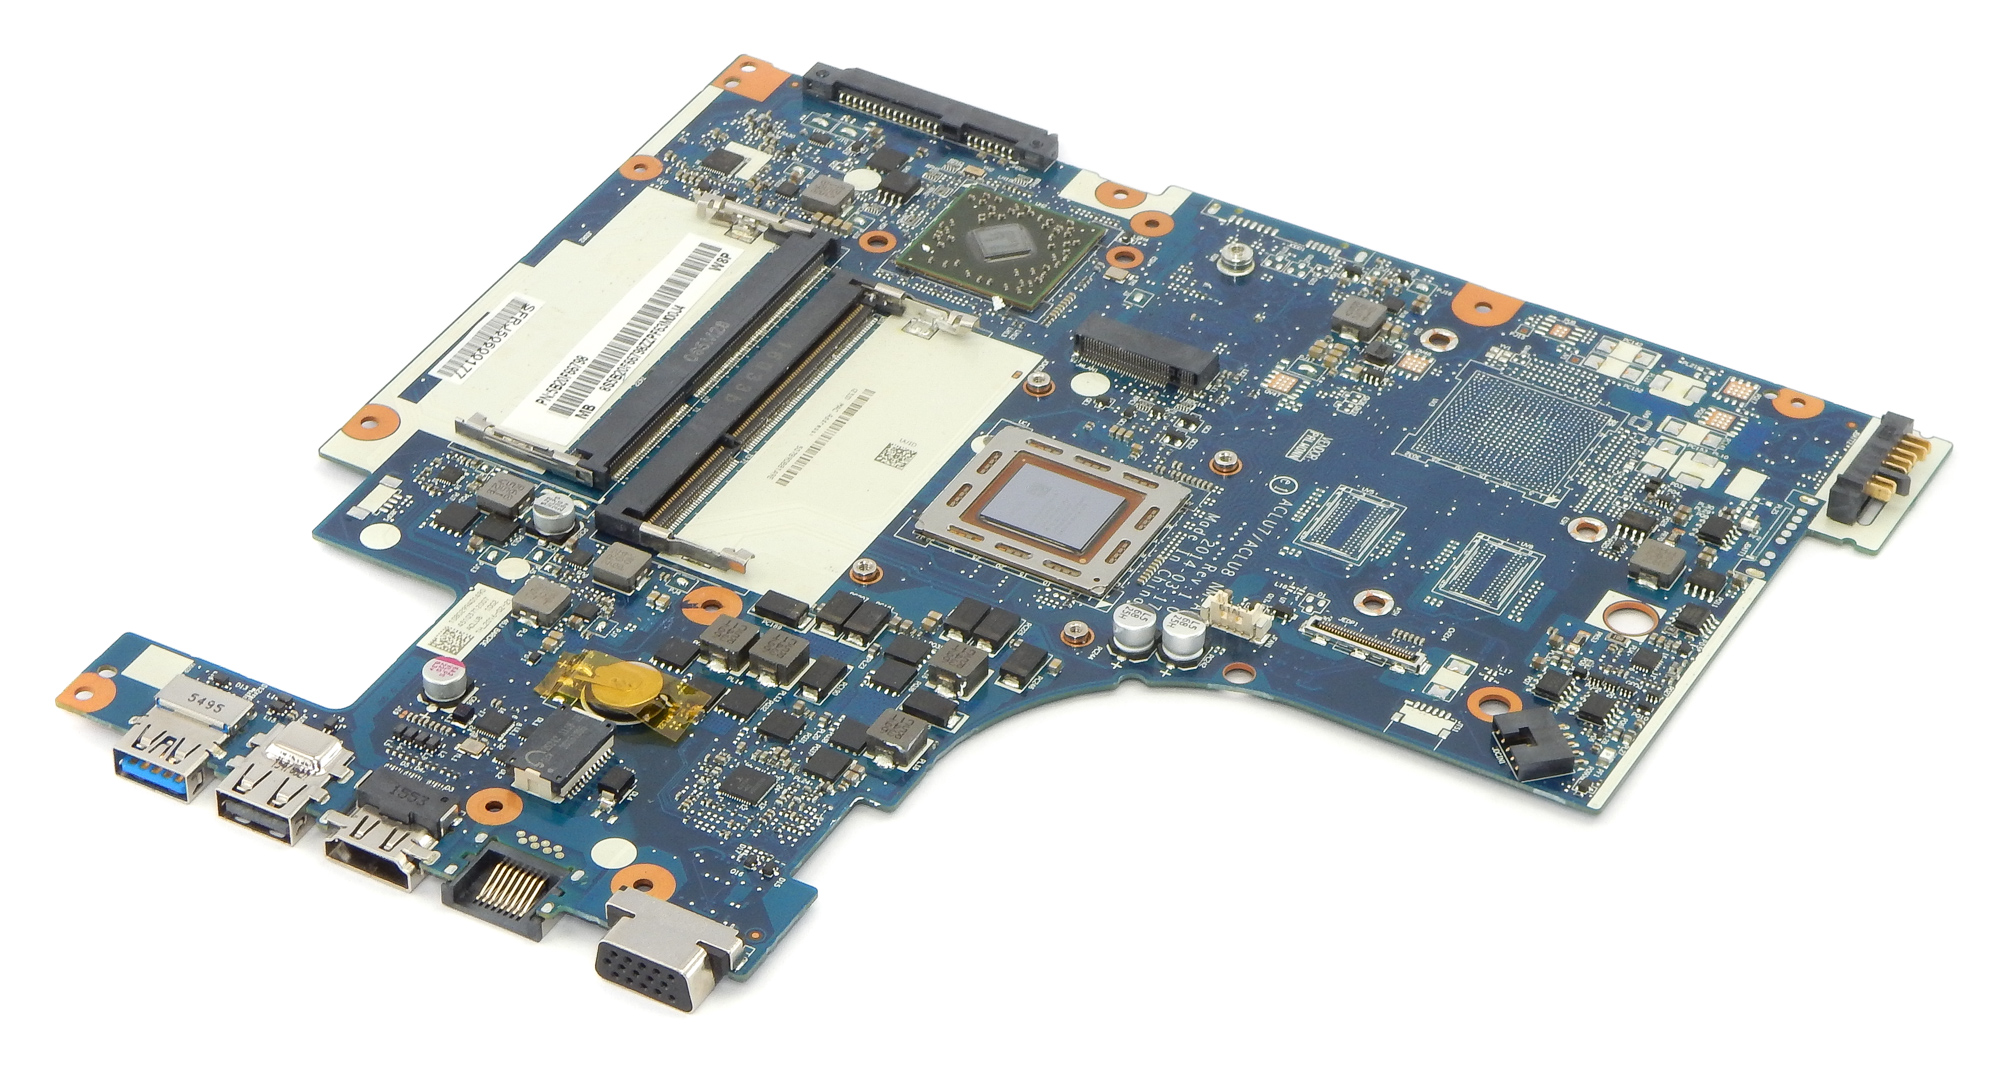 5B20F66798 Lenovo Z50-75 Motherboard with BGA AMD A10-7300 CPU